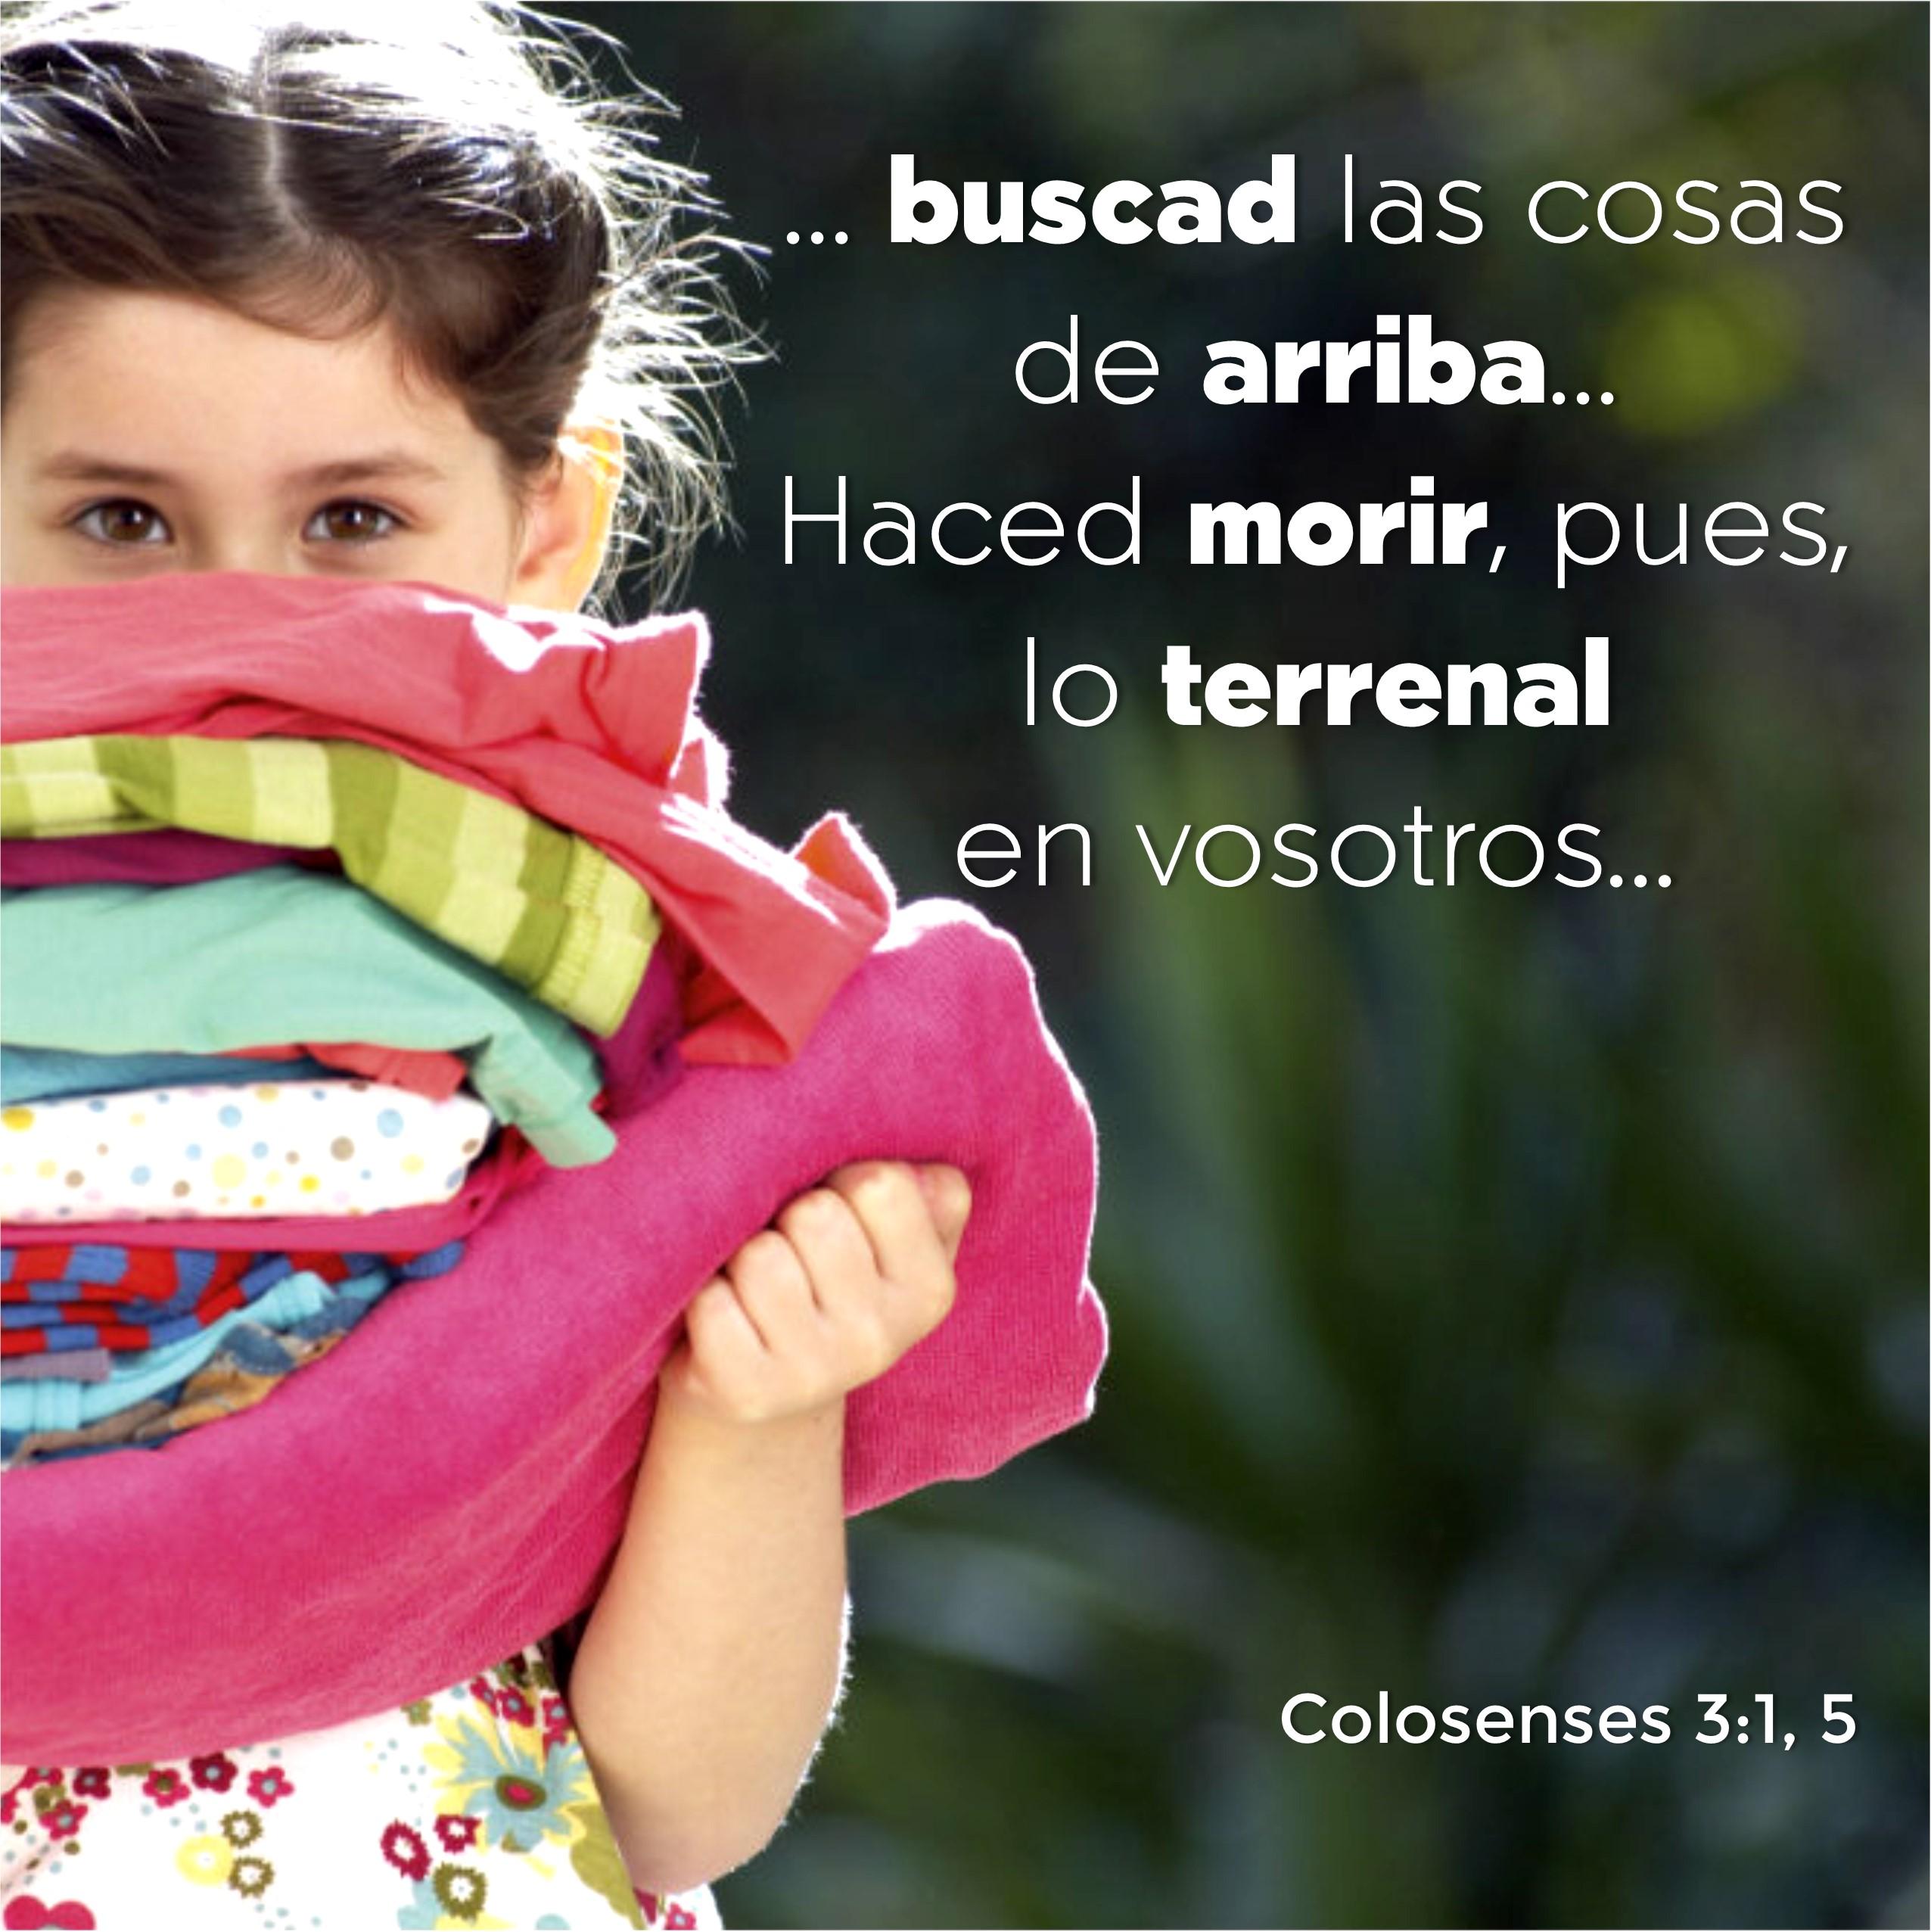 Colosenses 3.1, 5 Anexo